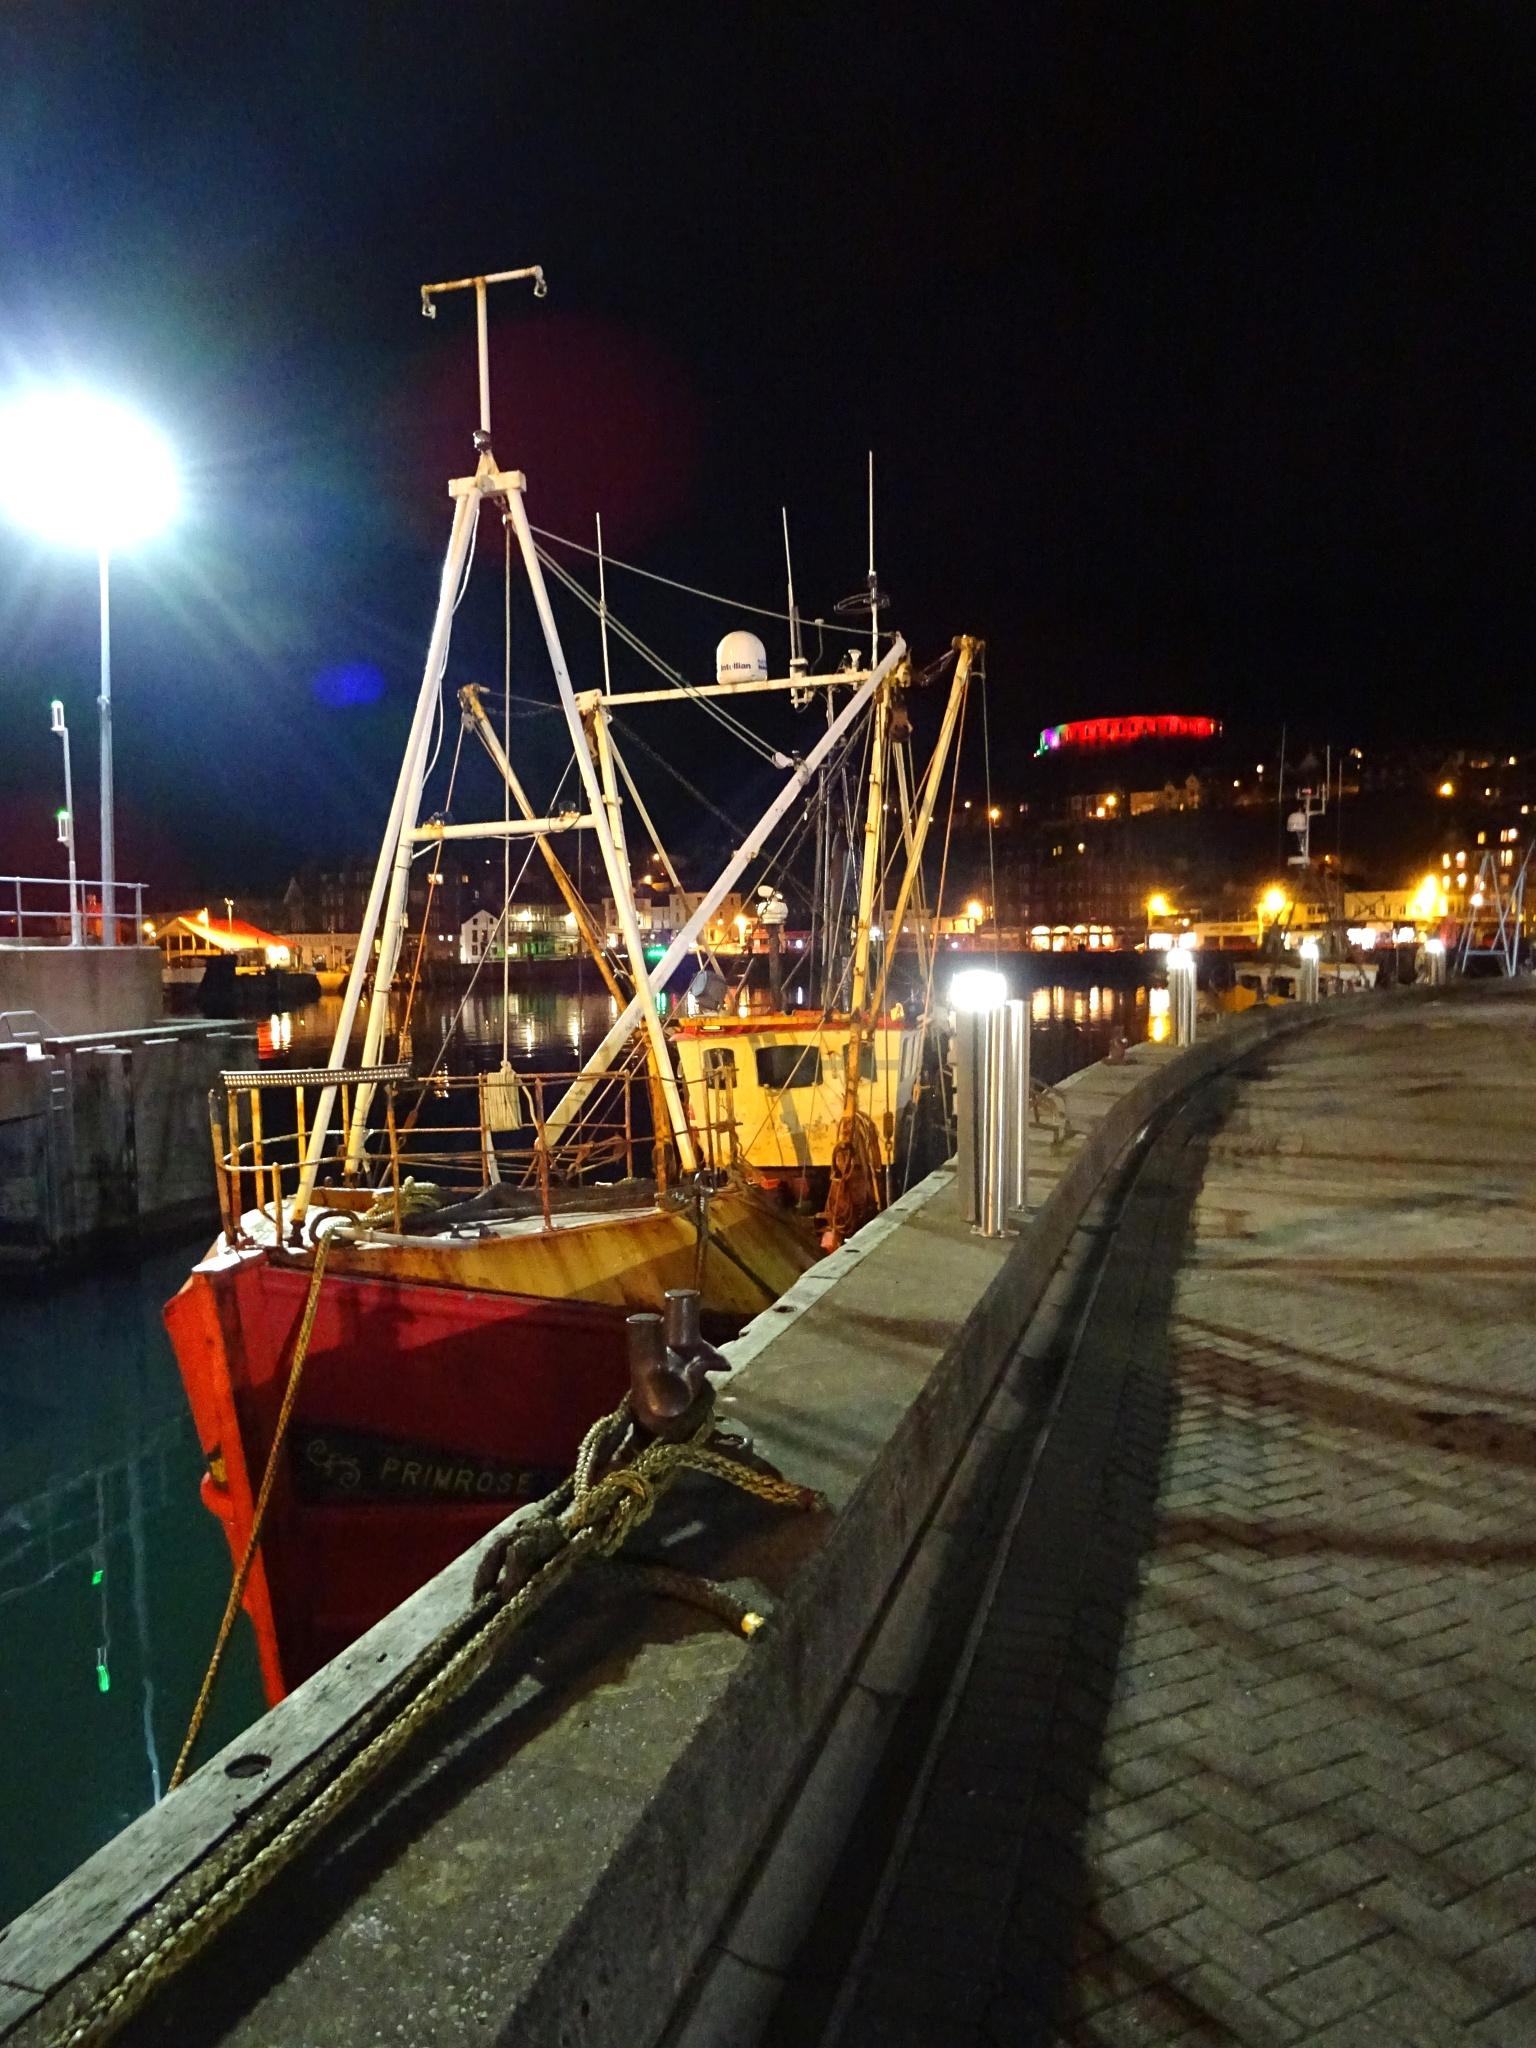 Night Harbour at Oban, Scotland by kayThornton